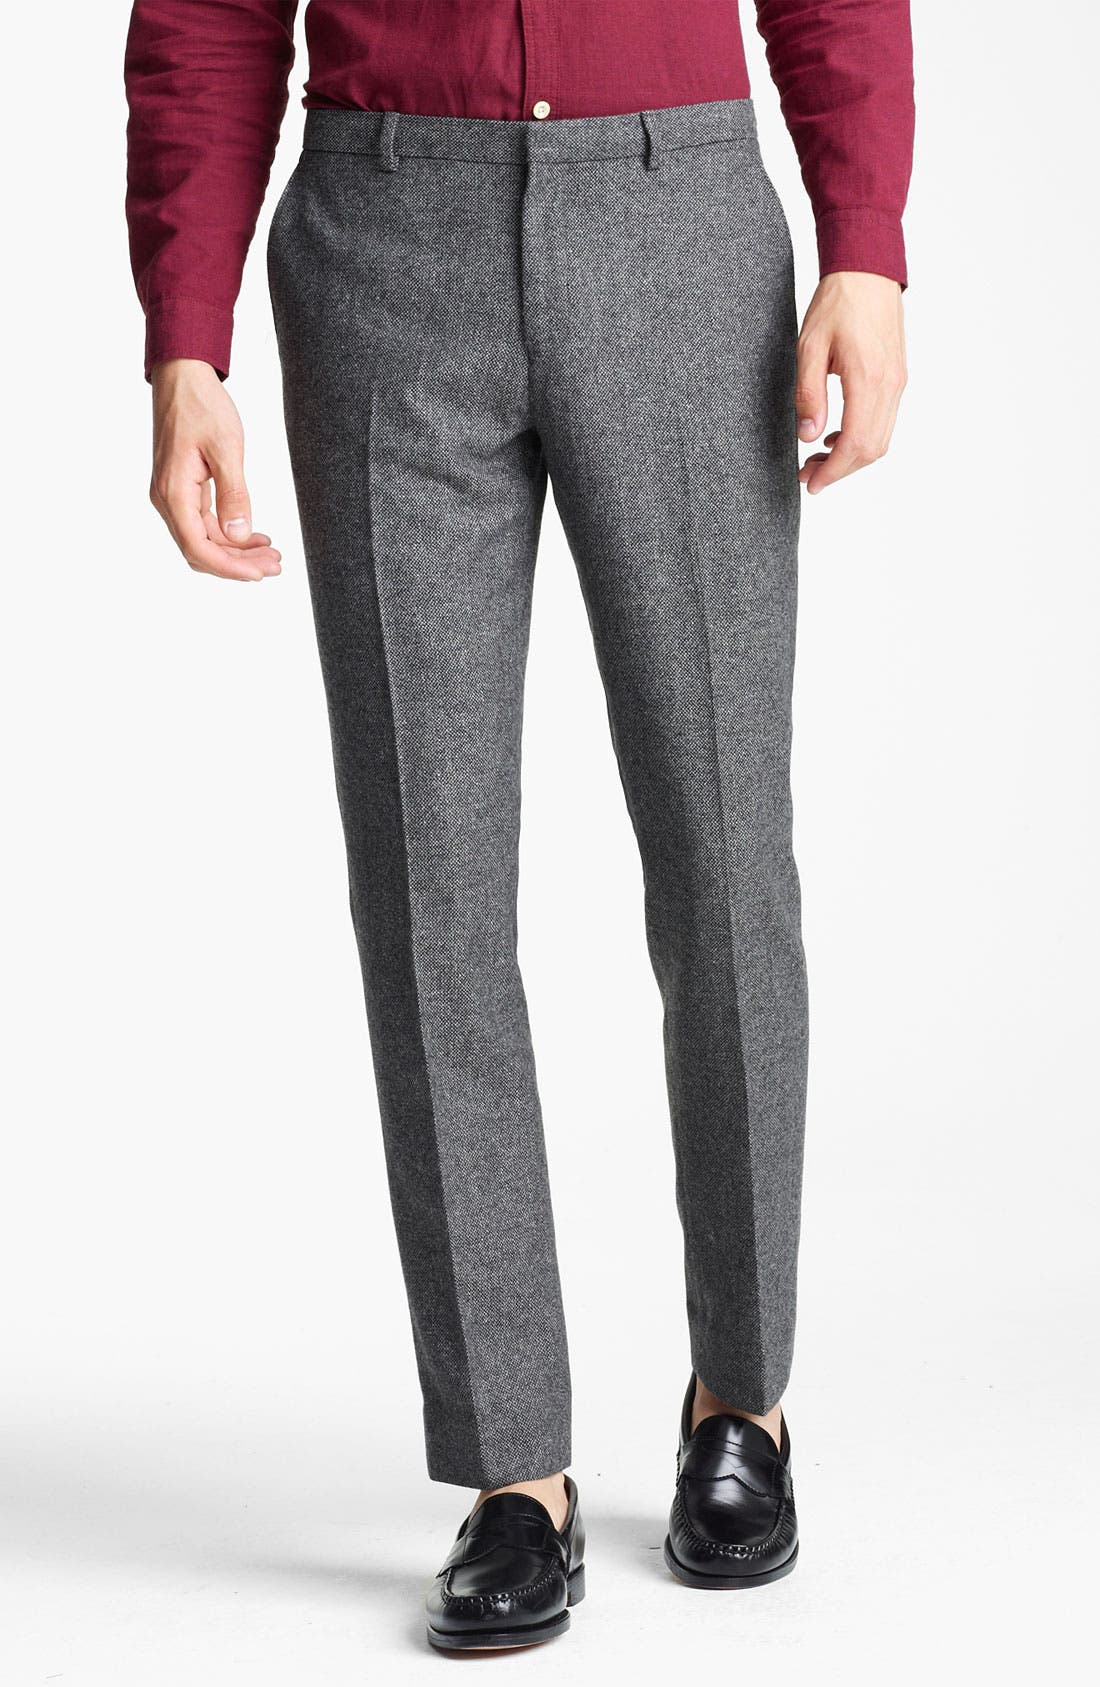 Main Image - Topman 'Vento' Tweed Skinny Trousers